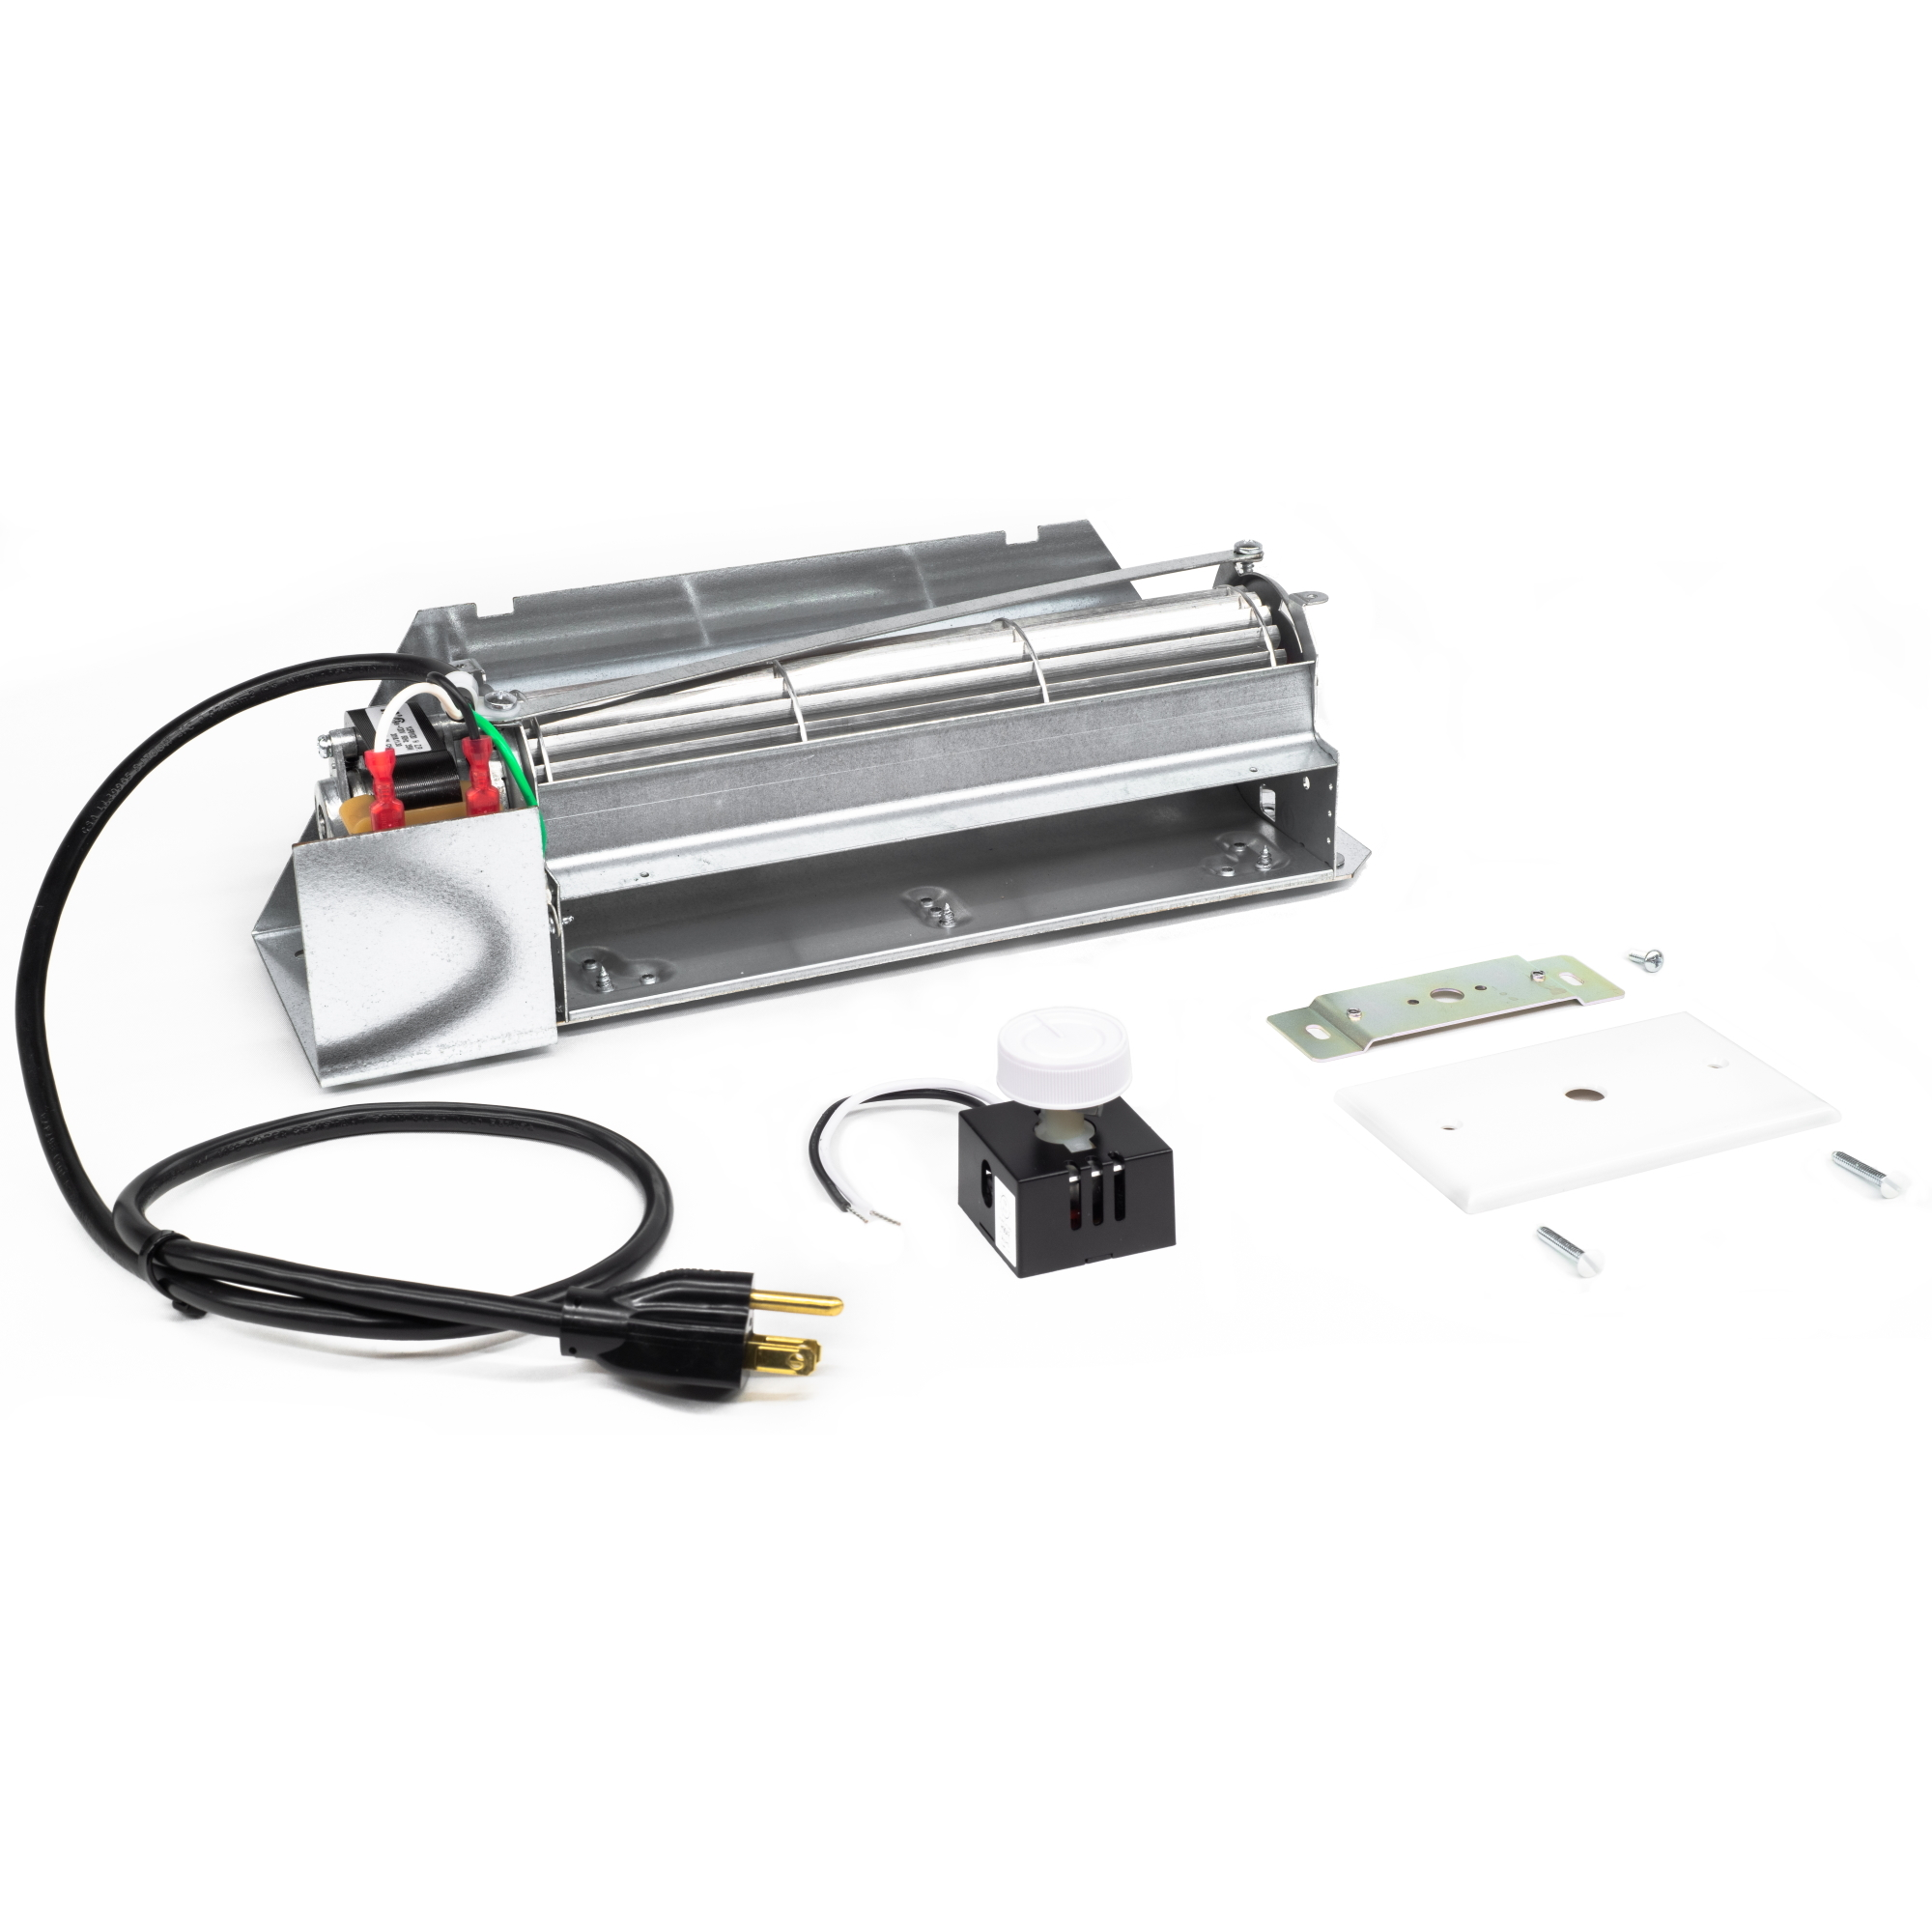 FBK-200 Fireplace Blower Kit for Astria, Lennox & Superior Fireplaces